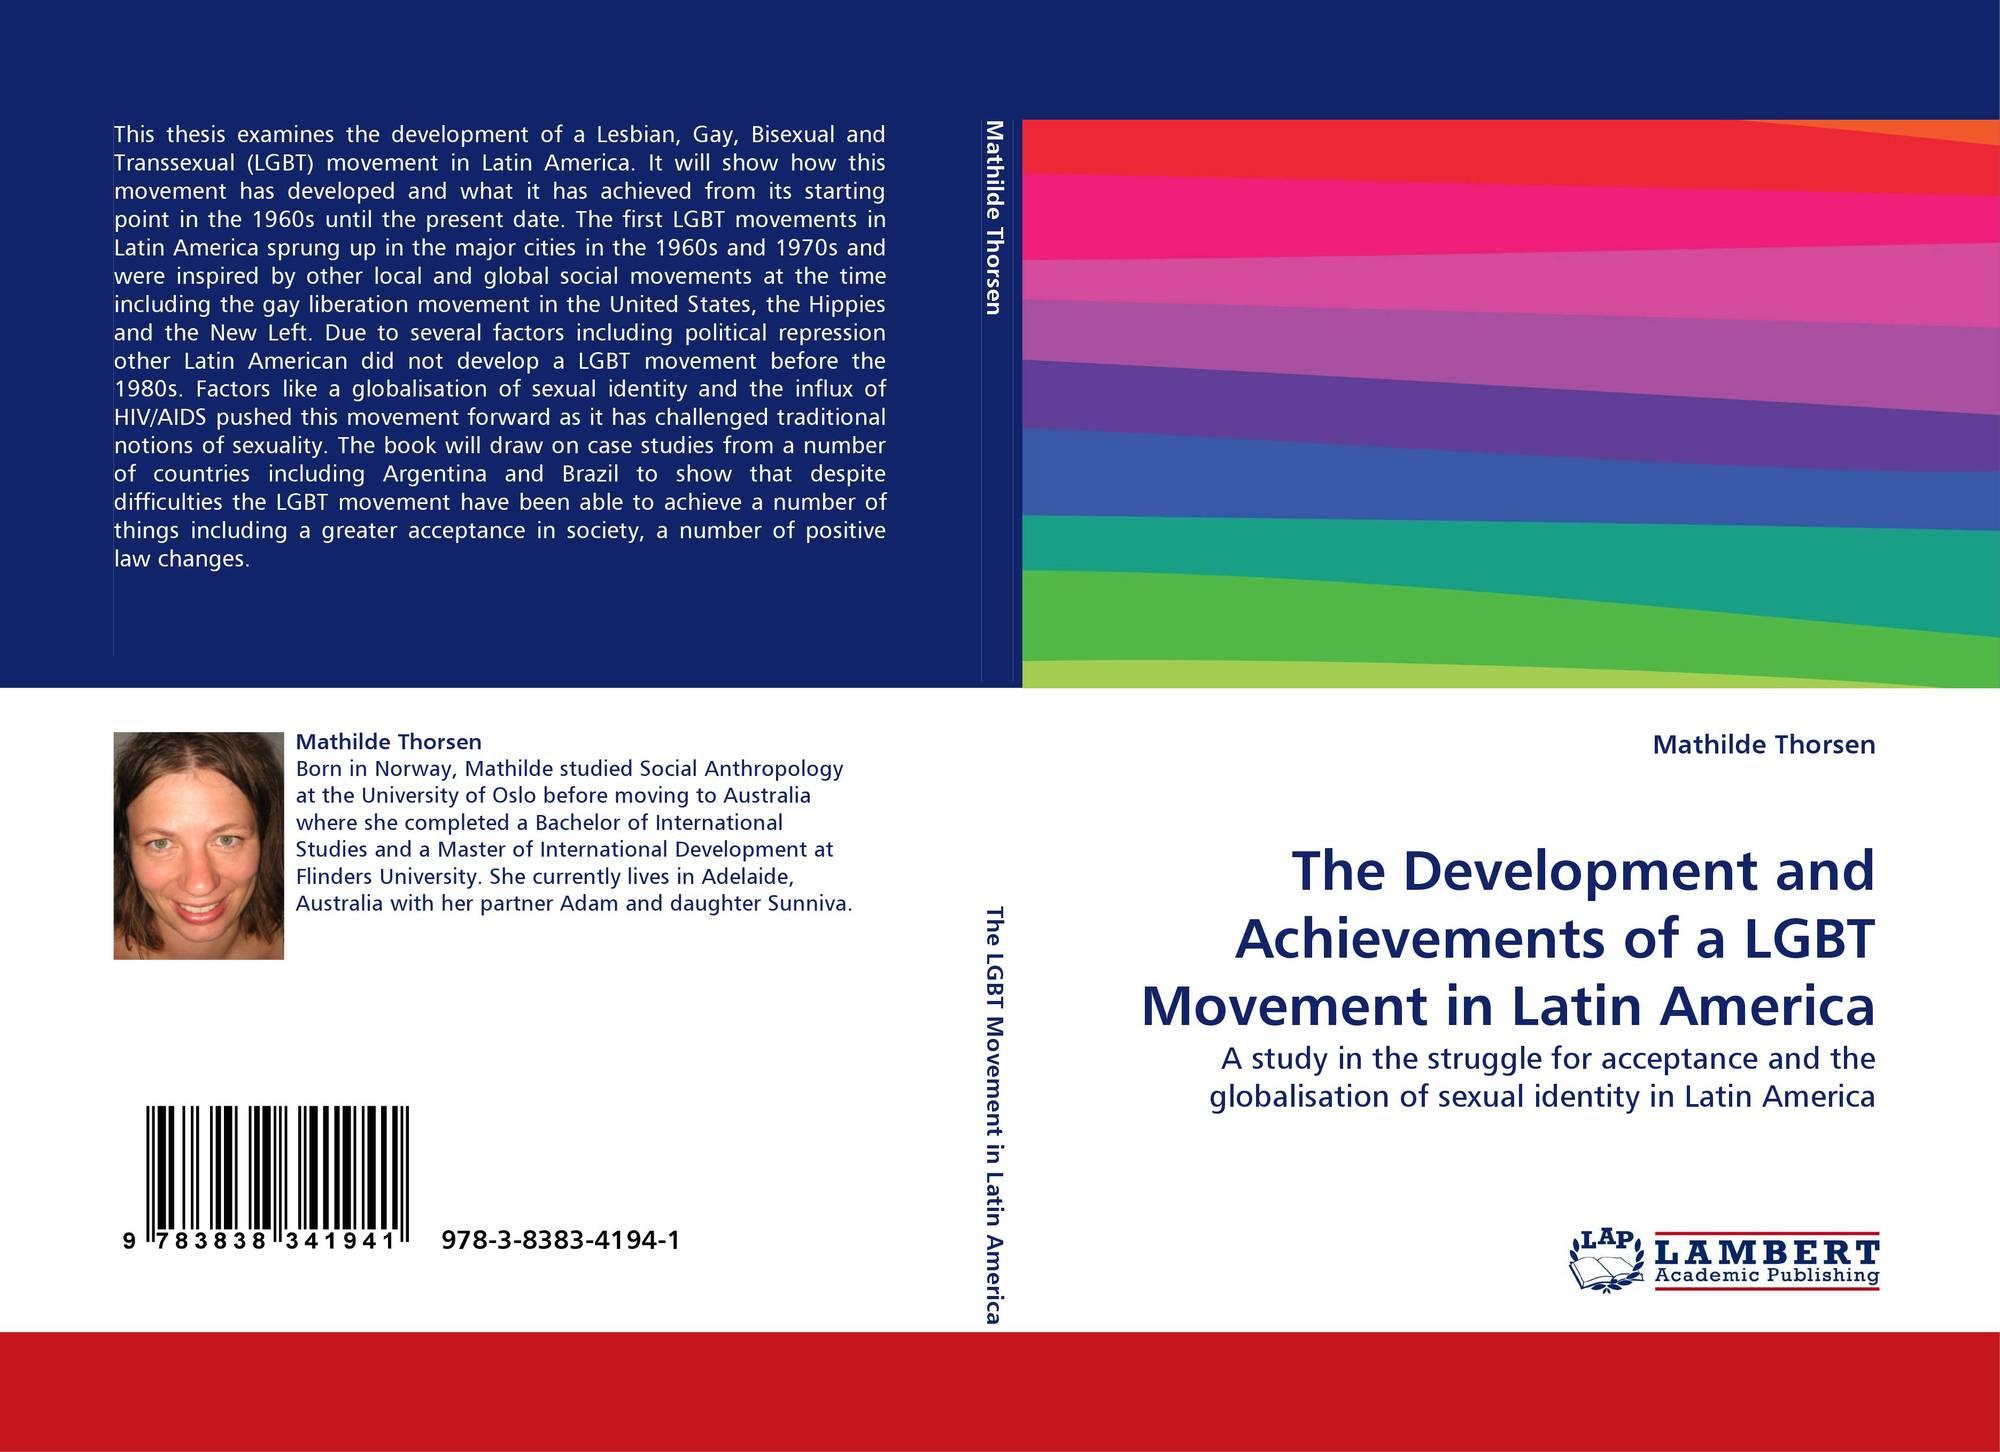 thesis international development studies